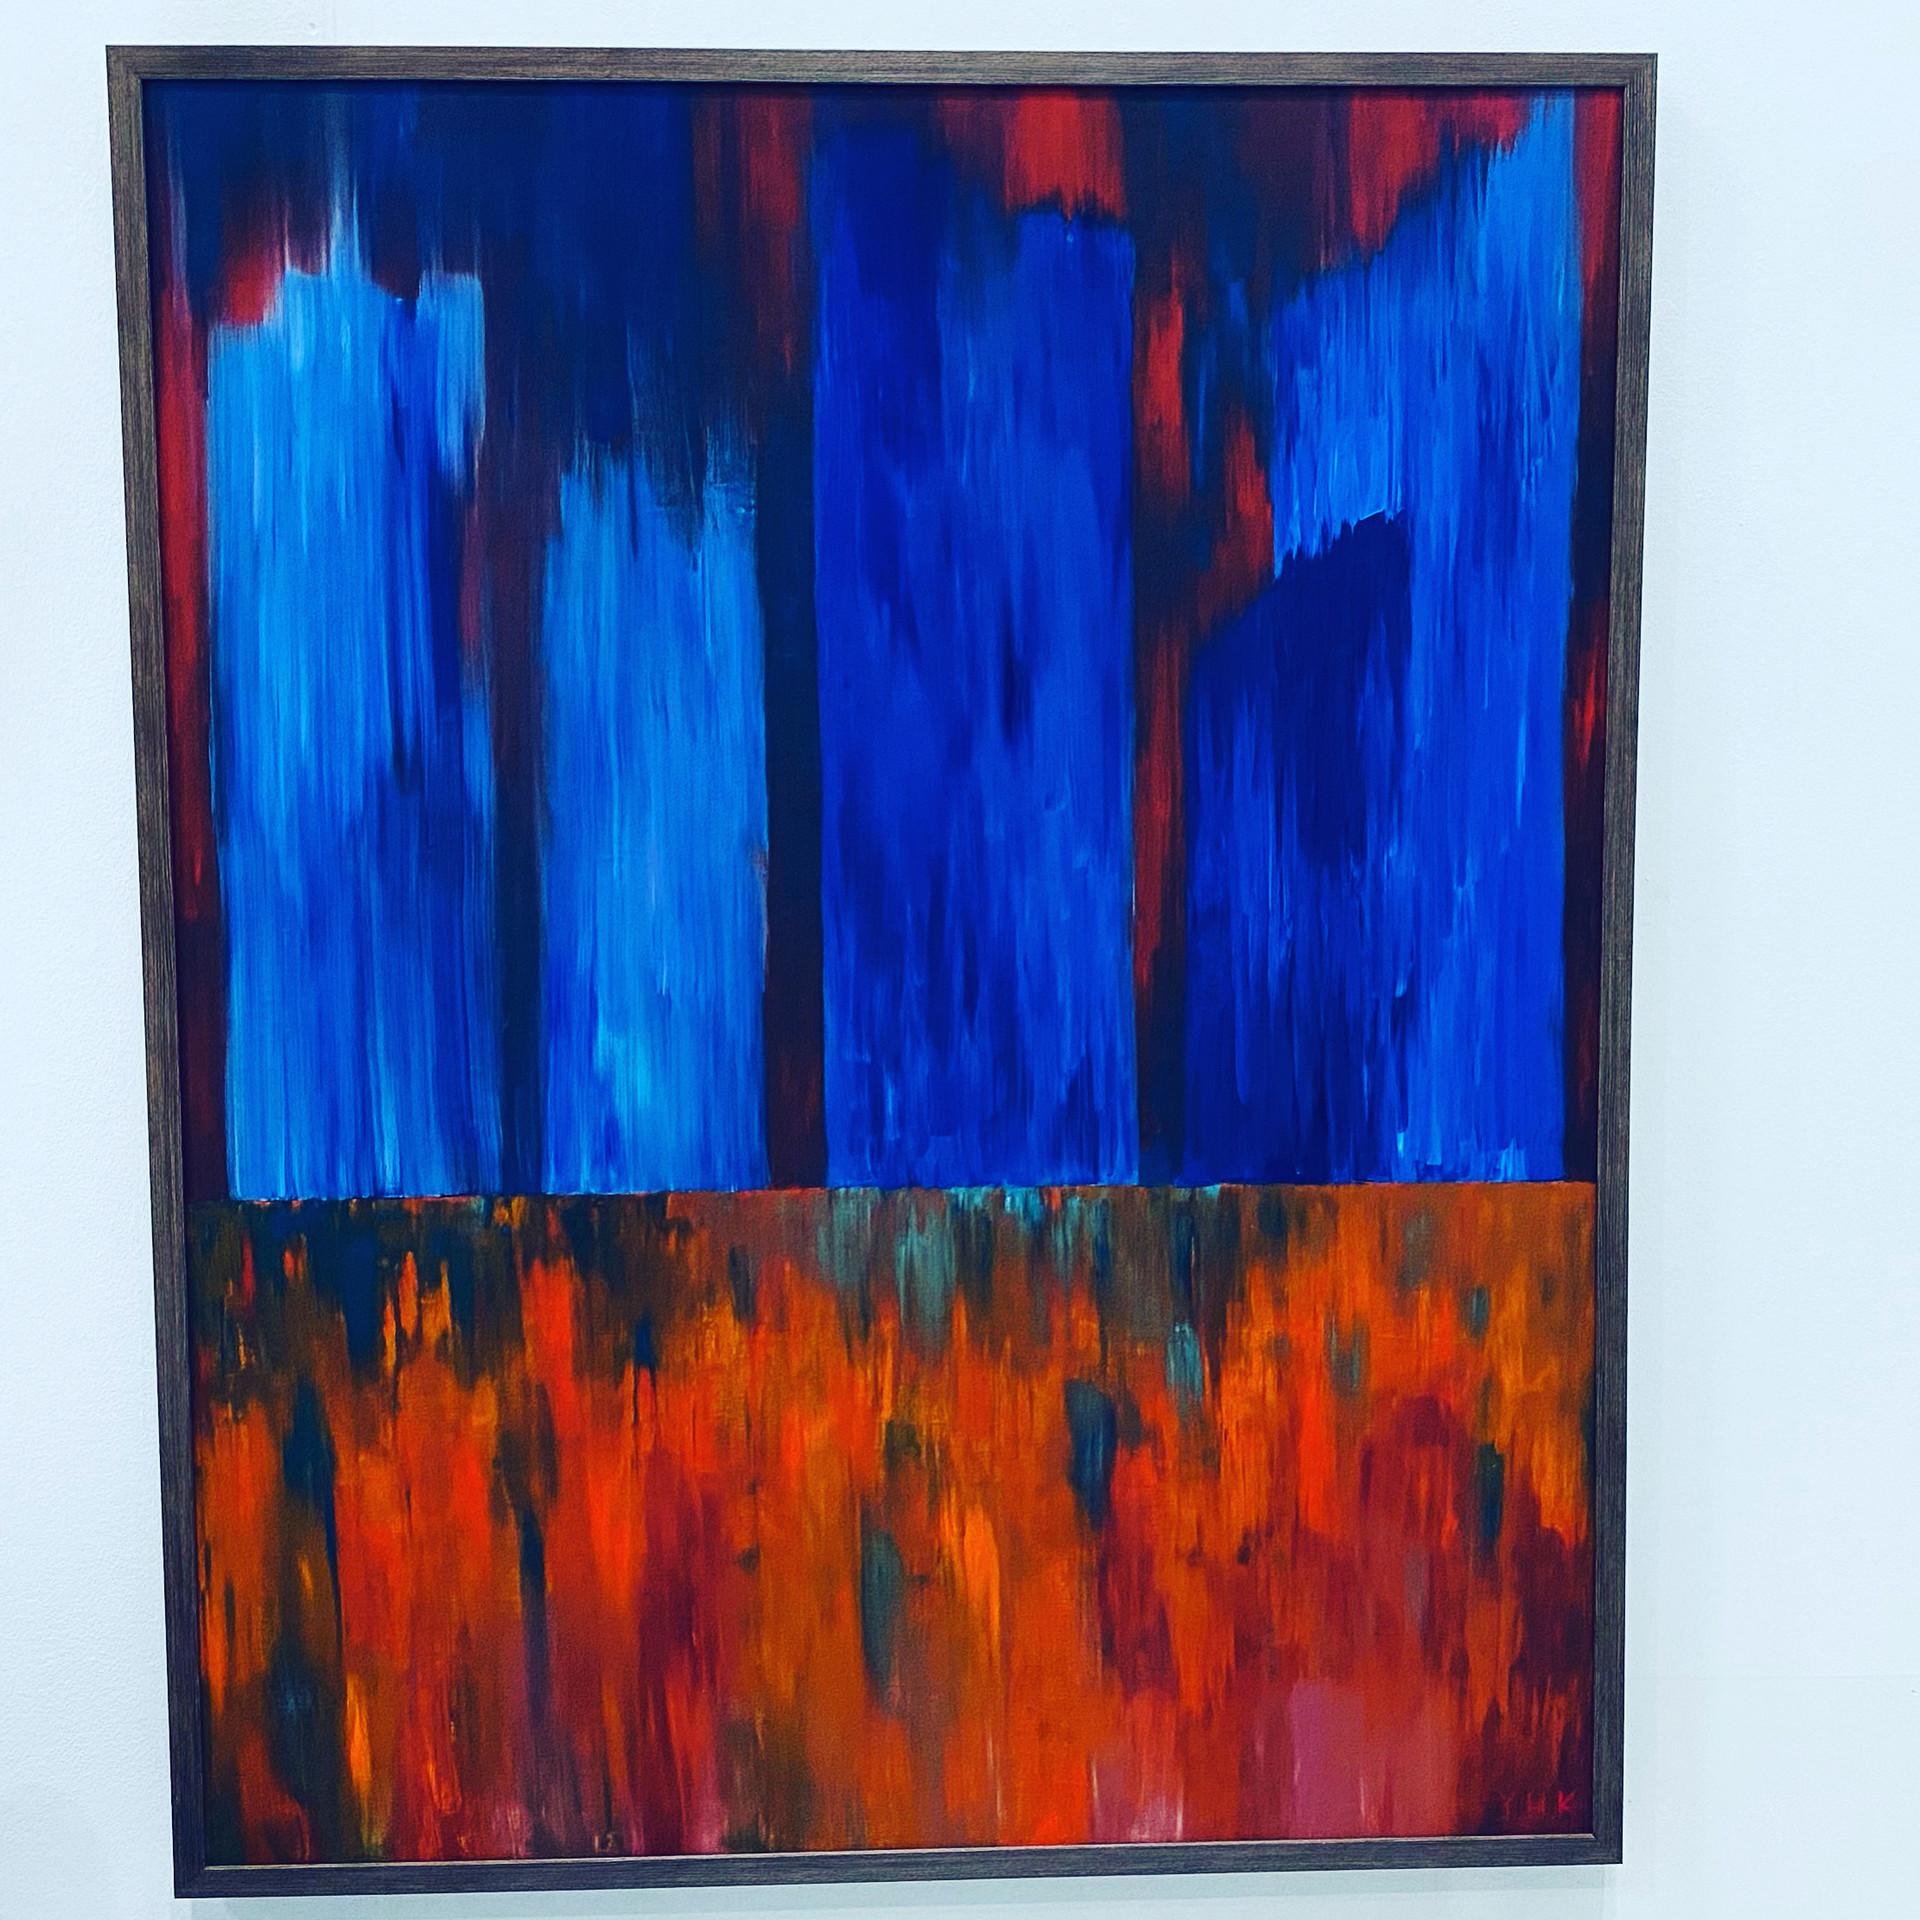 Cityscape, 2020, Oil on canvas